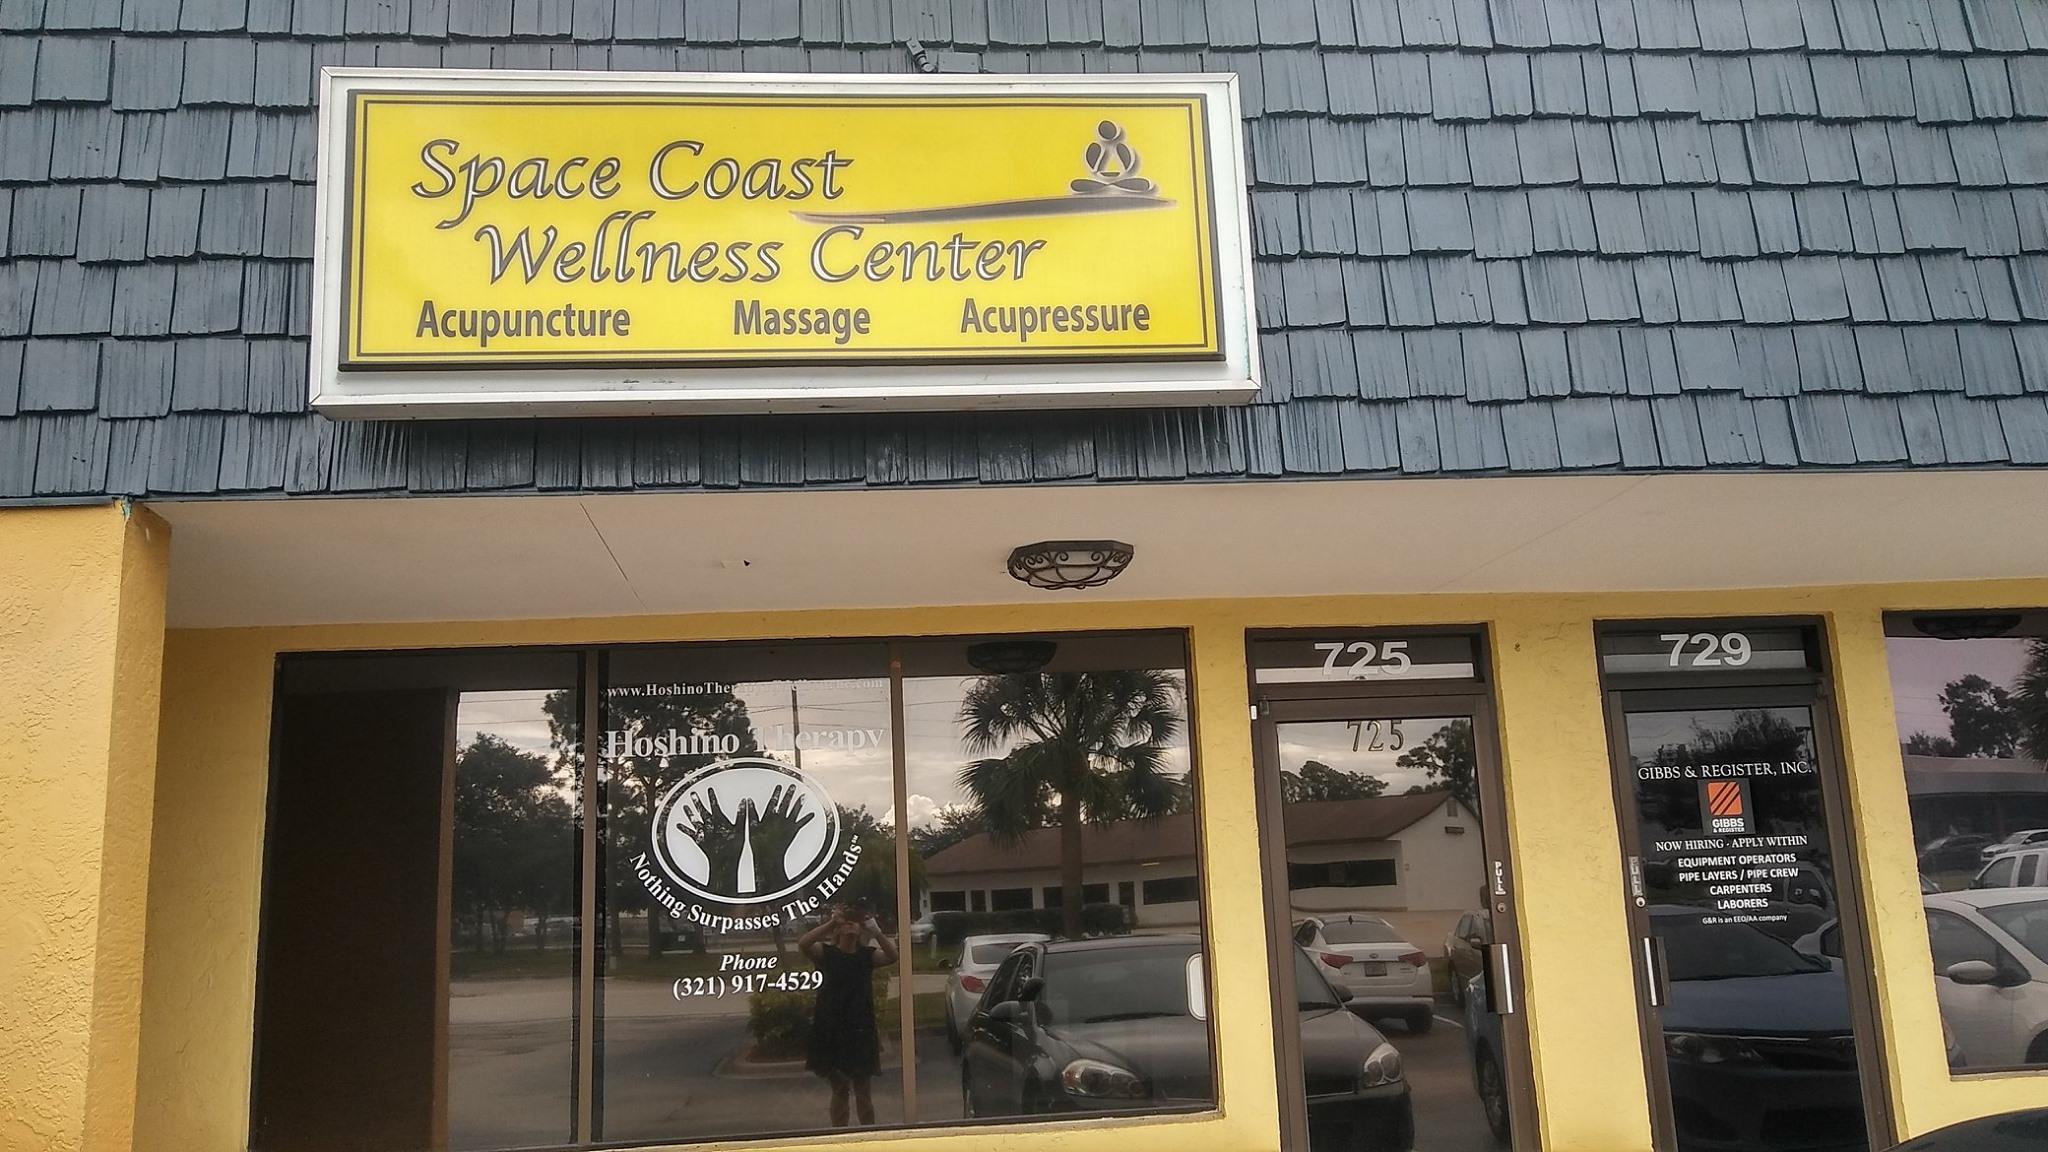 Space Coast Wellness Center